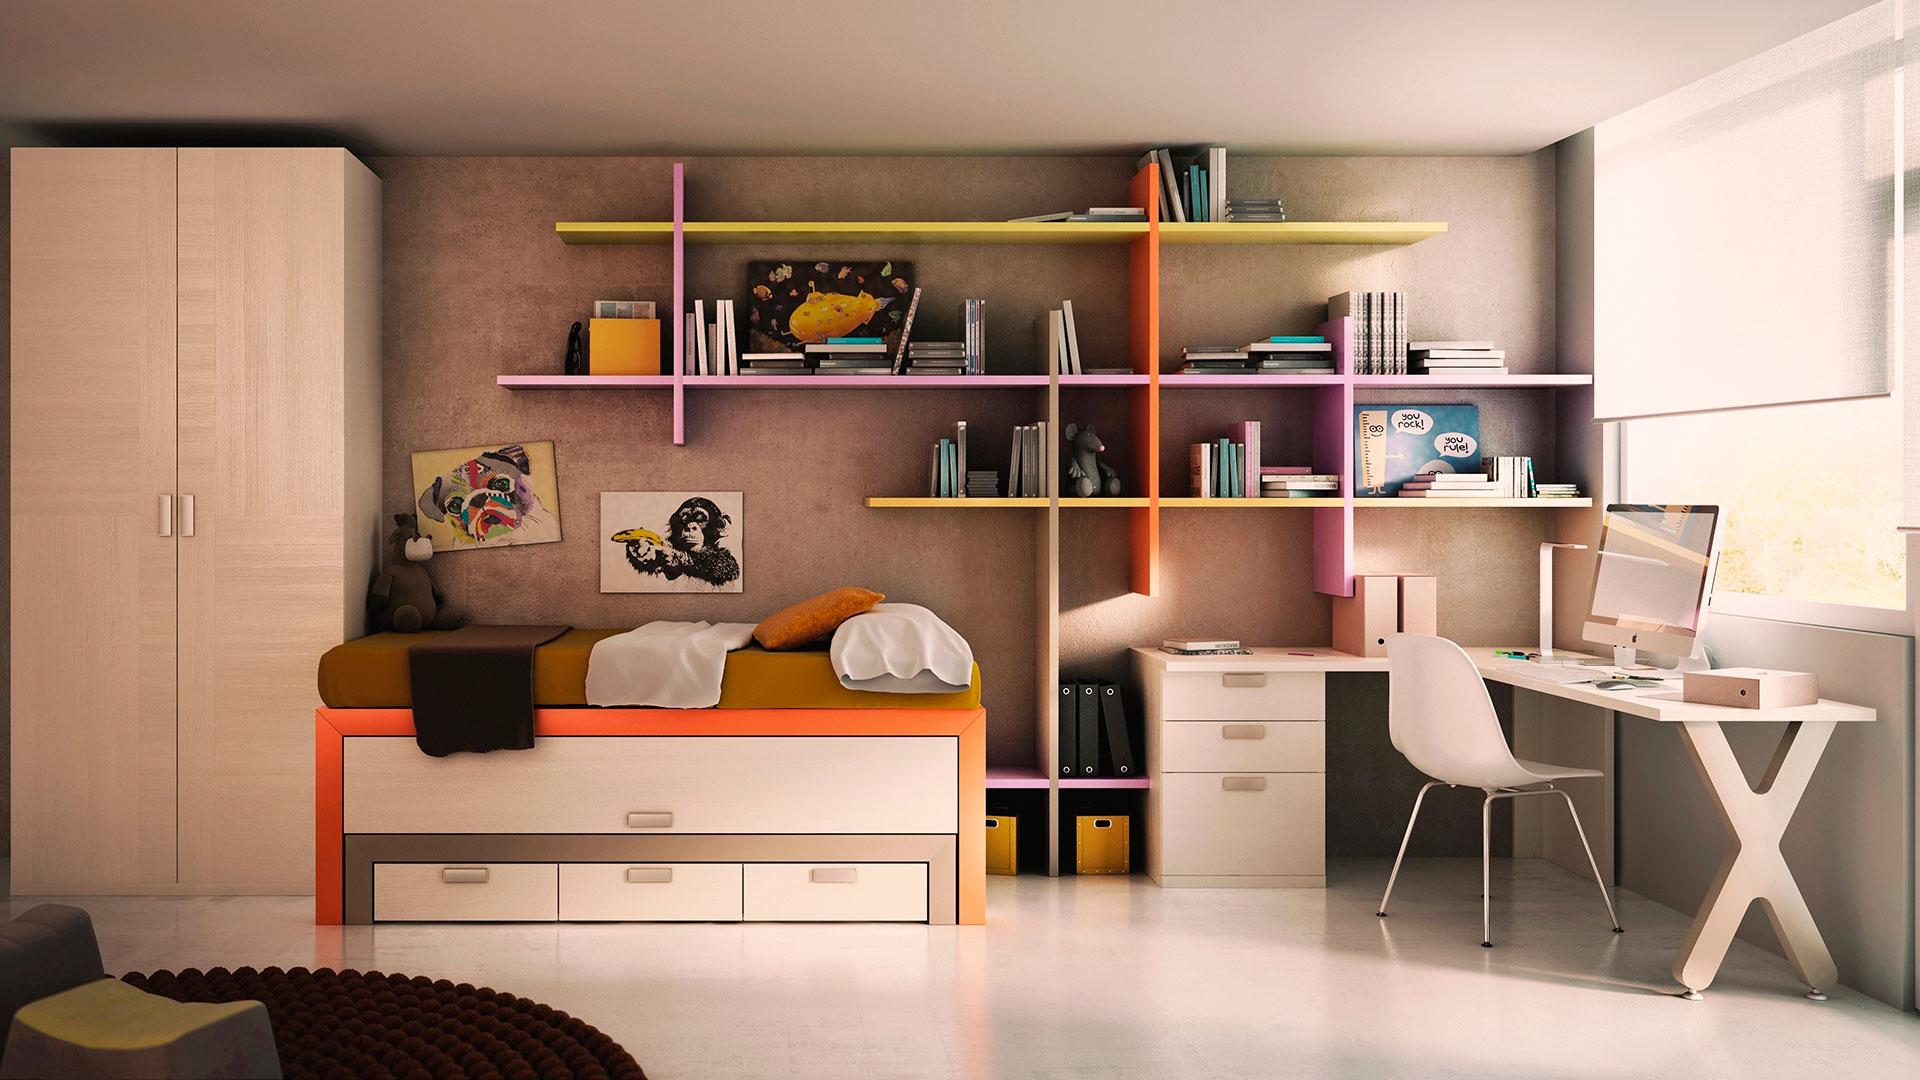 Muebles baratos lepe obtenga ideas dise o de muebles for Transporte de muebles barato